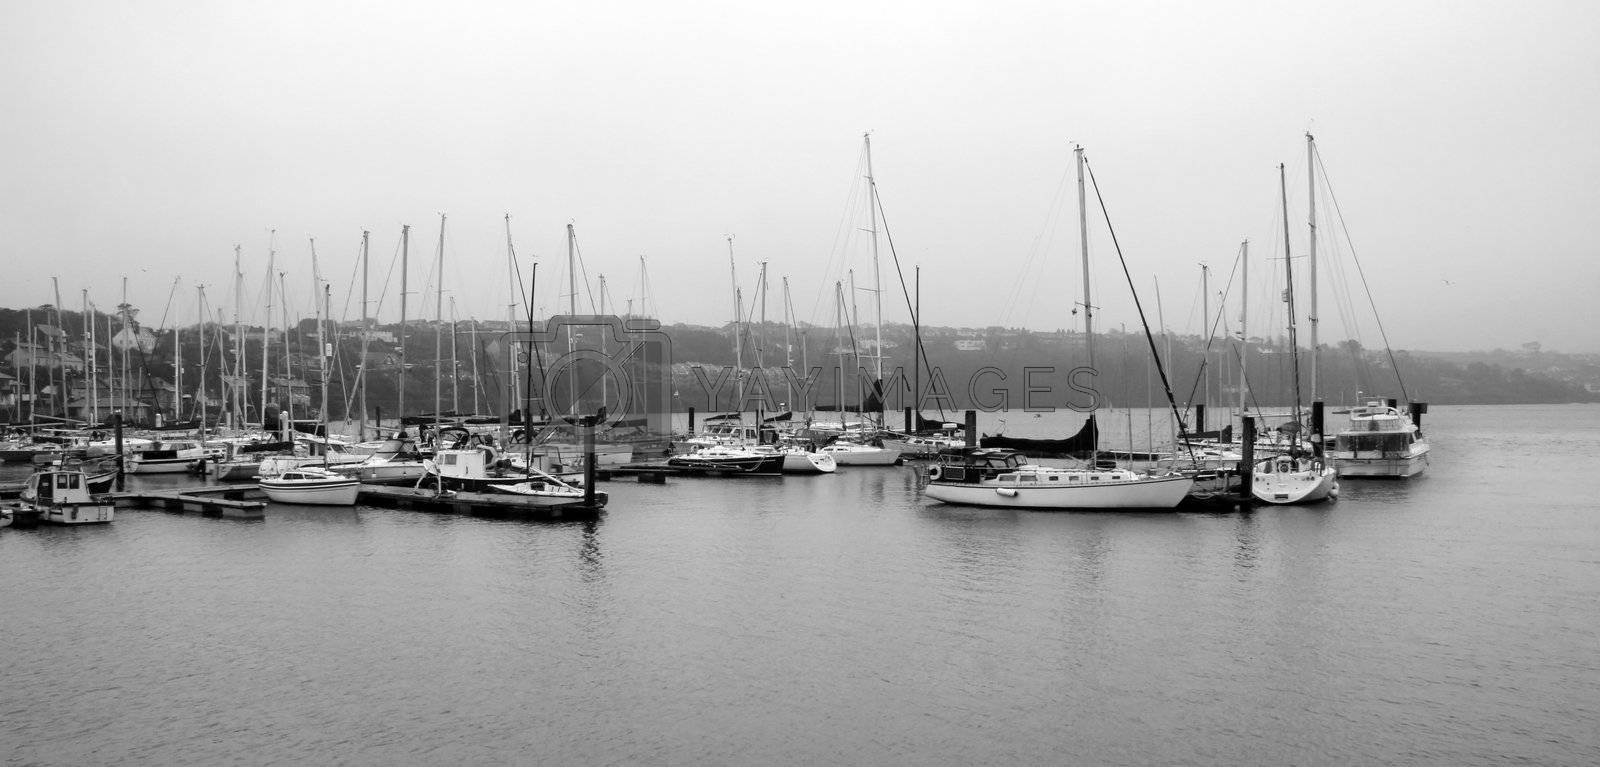 a fleet of boats moored up